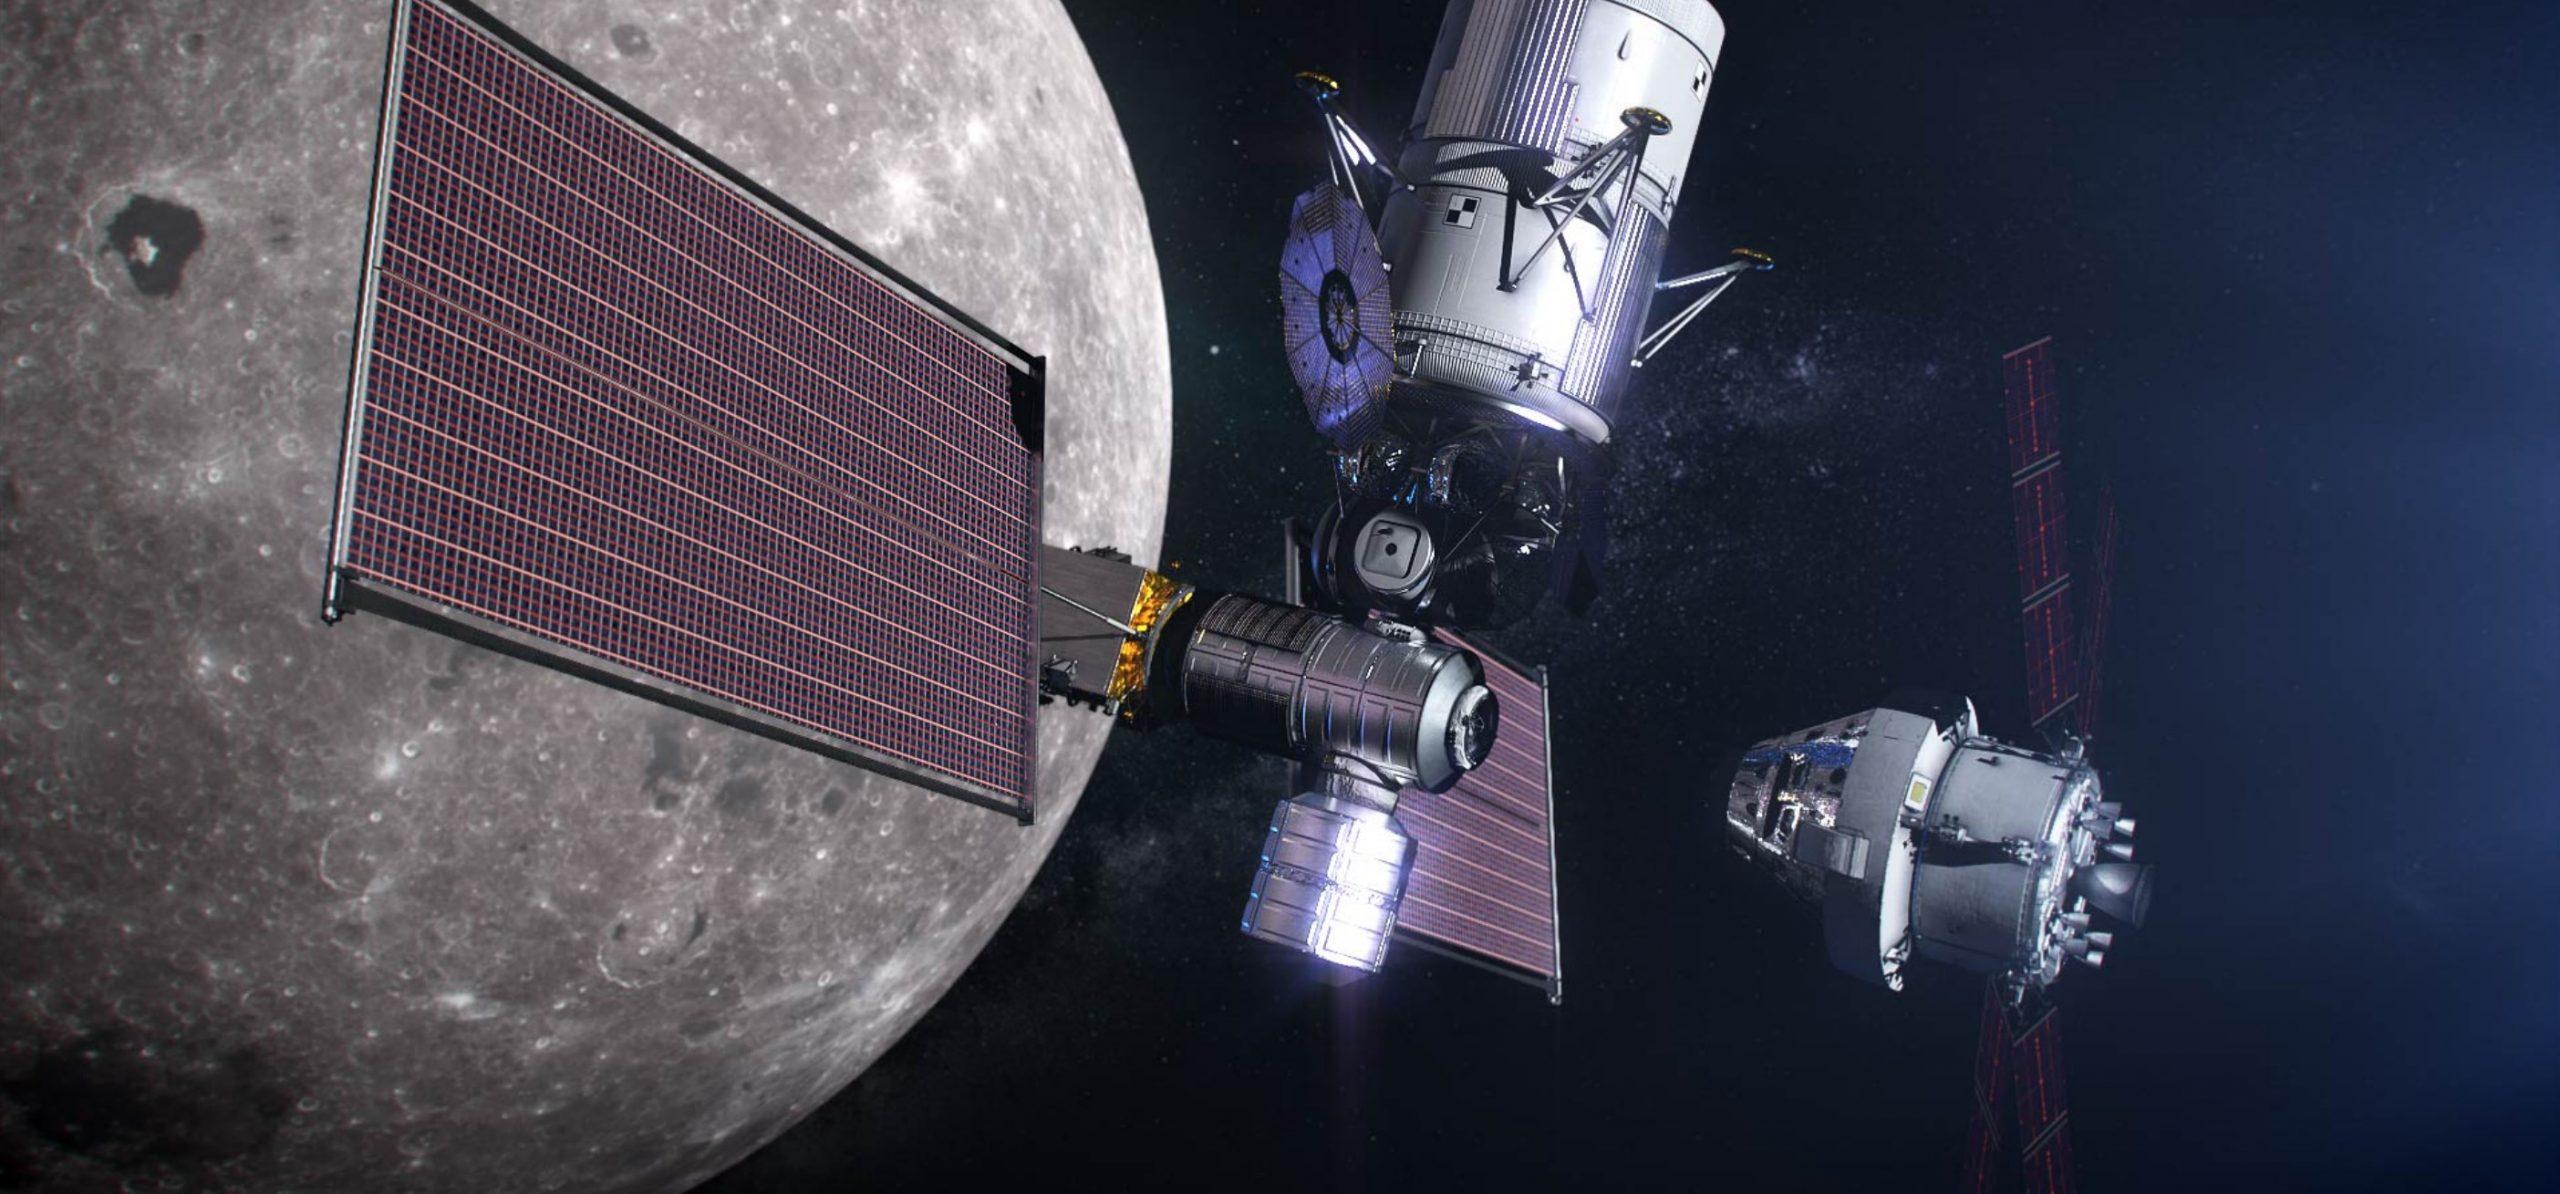 Gateway PPE + habitation module (NASA) render 3